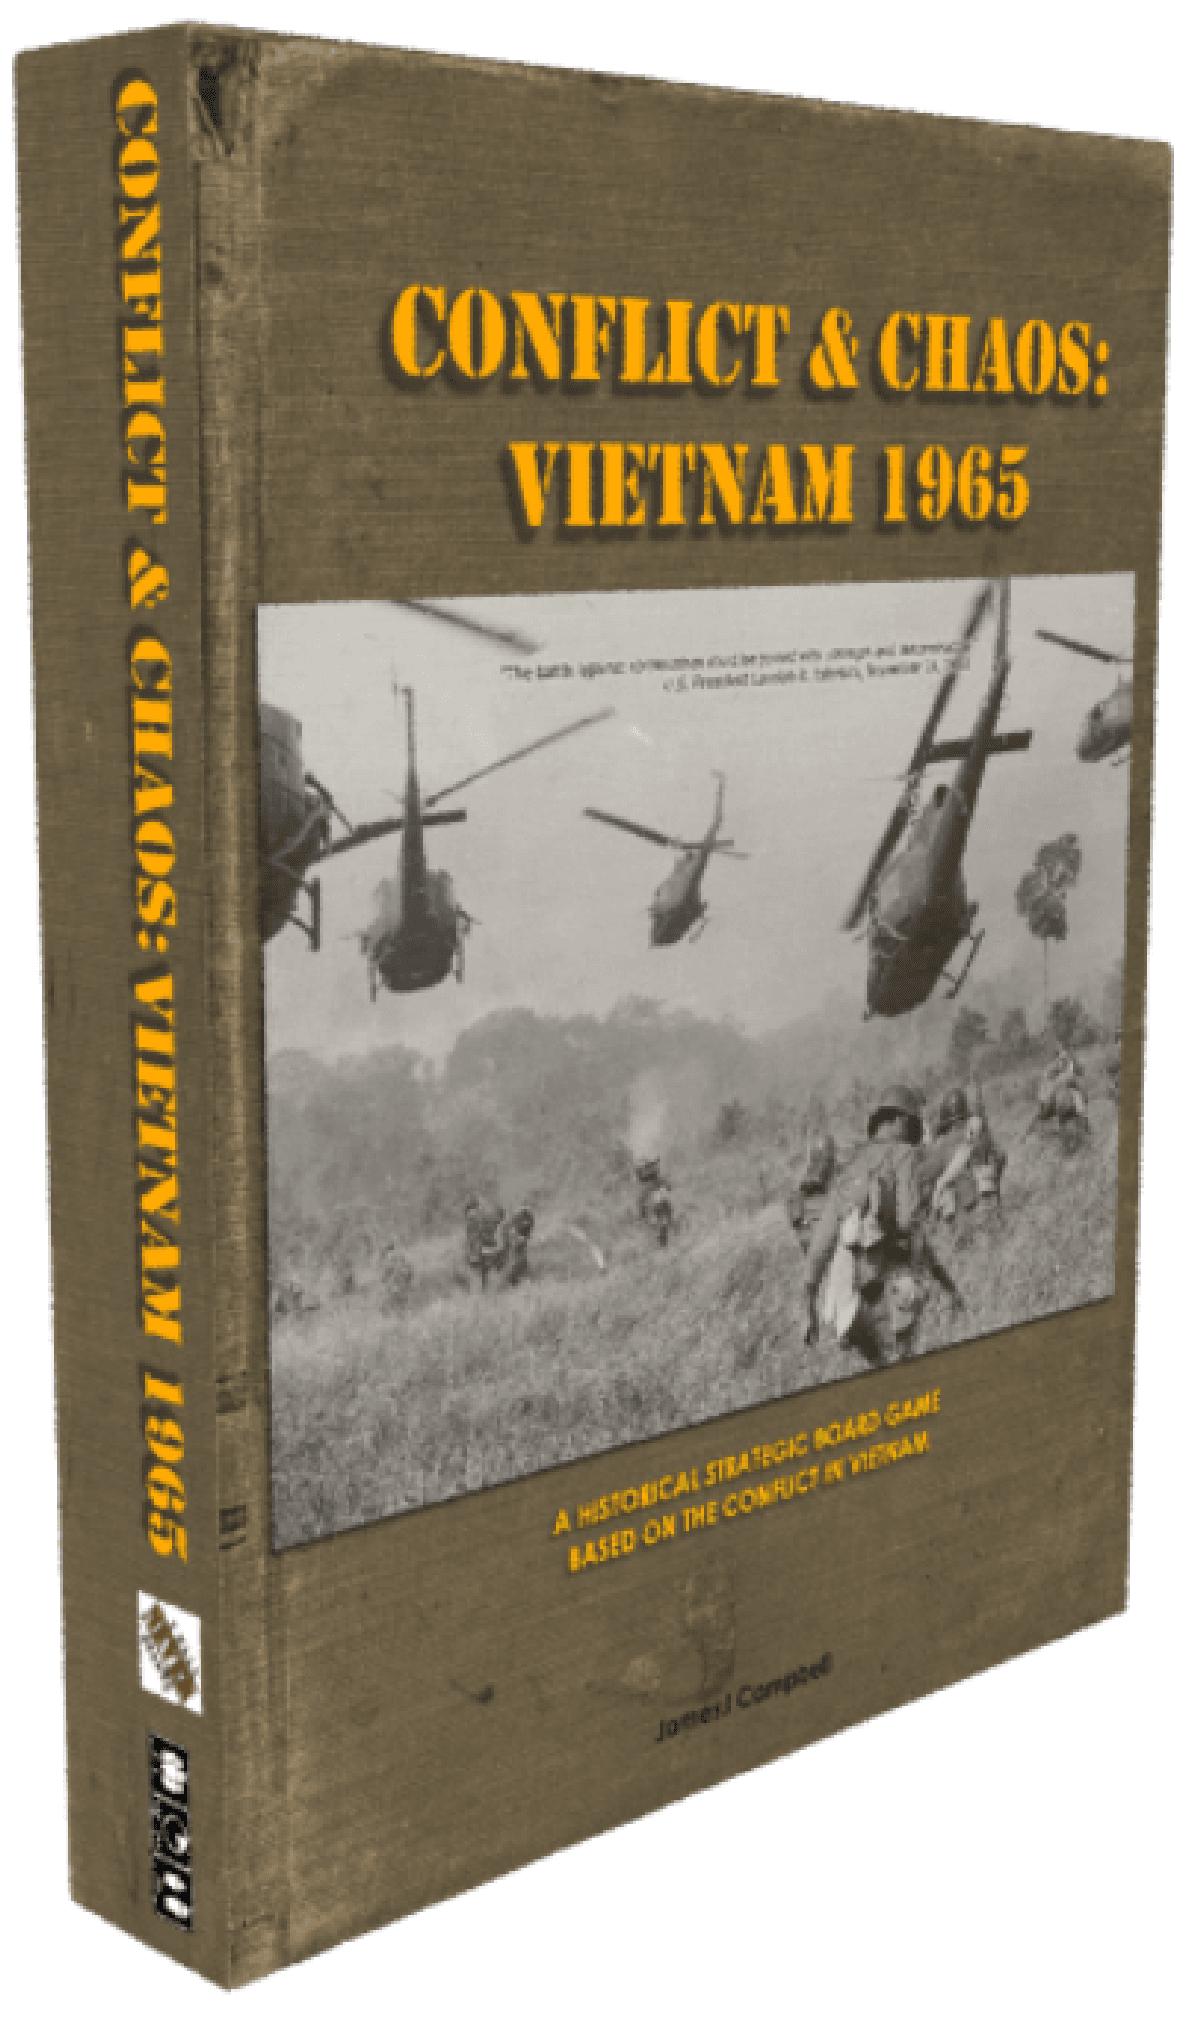 Conflict & Chaos: Vietnam 1965